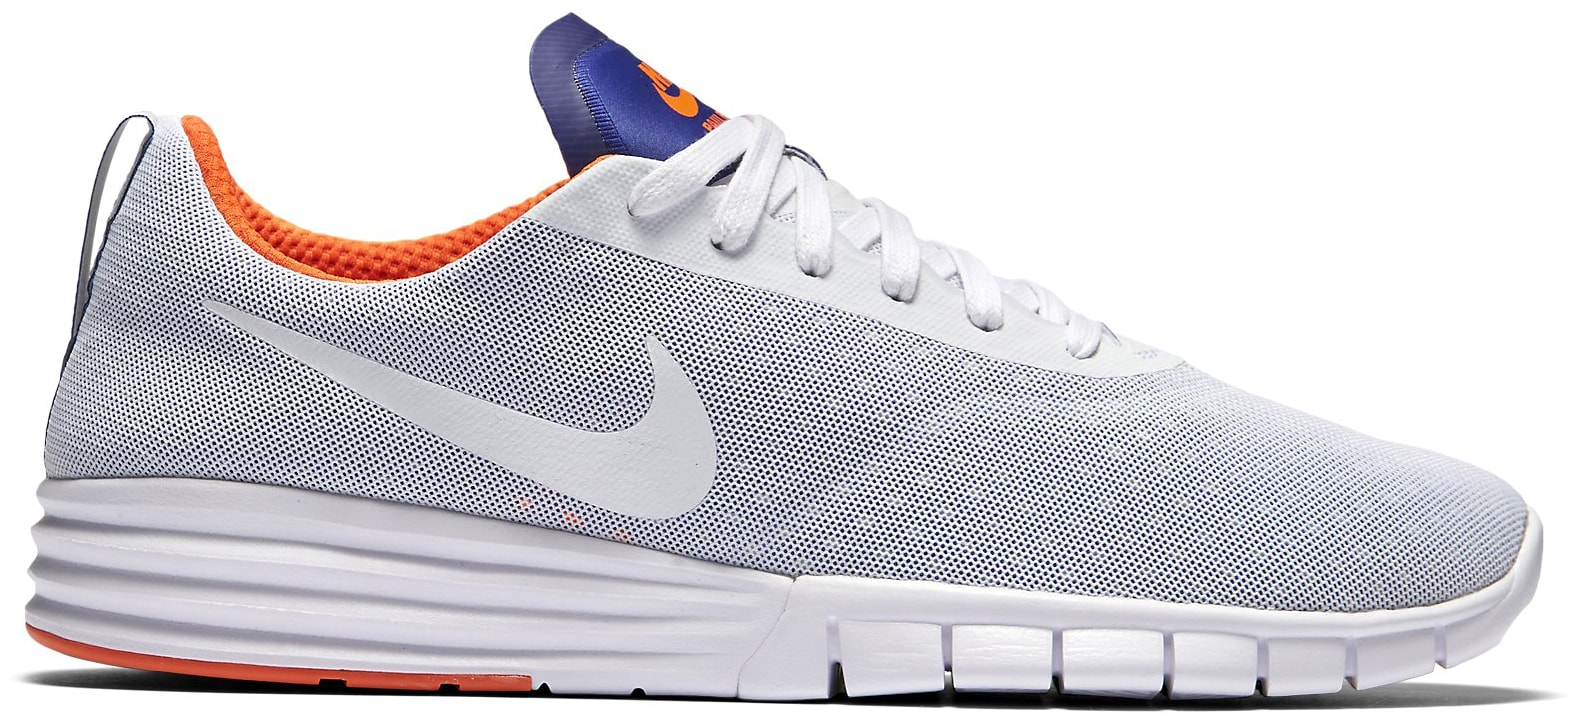 c88f48d3343b Nike SB Lunar Paul Rodriguez 9 Skate Shoes - thumbnail 1